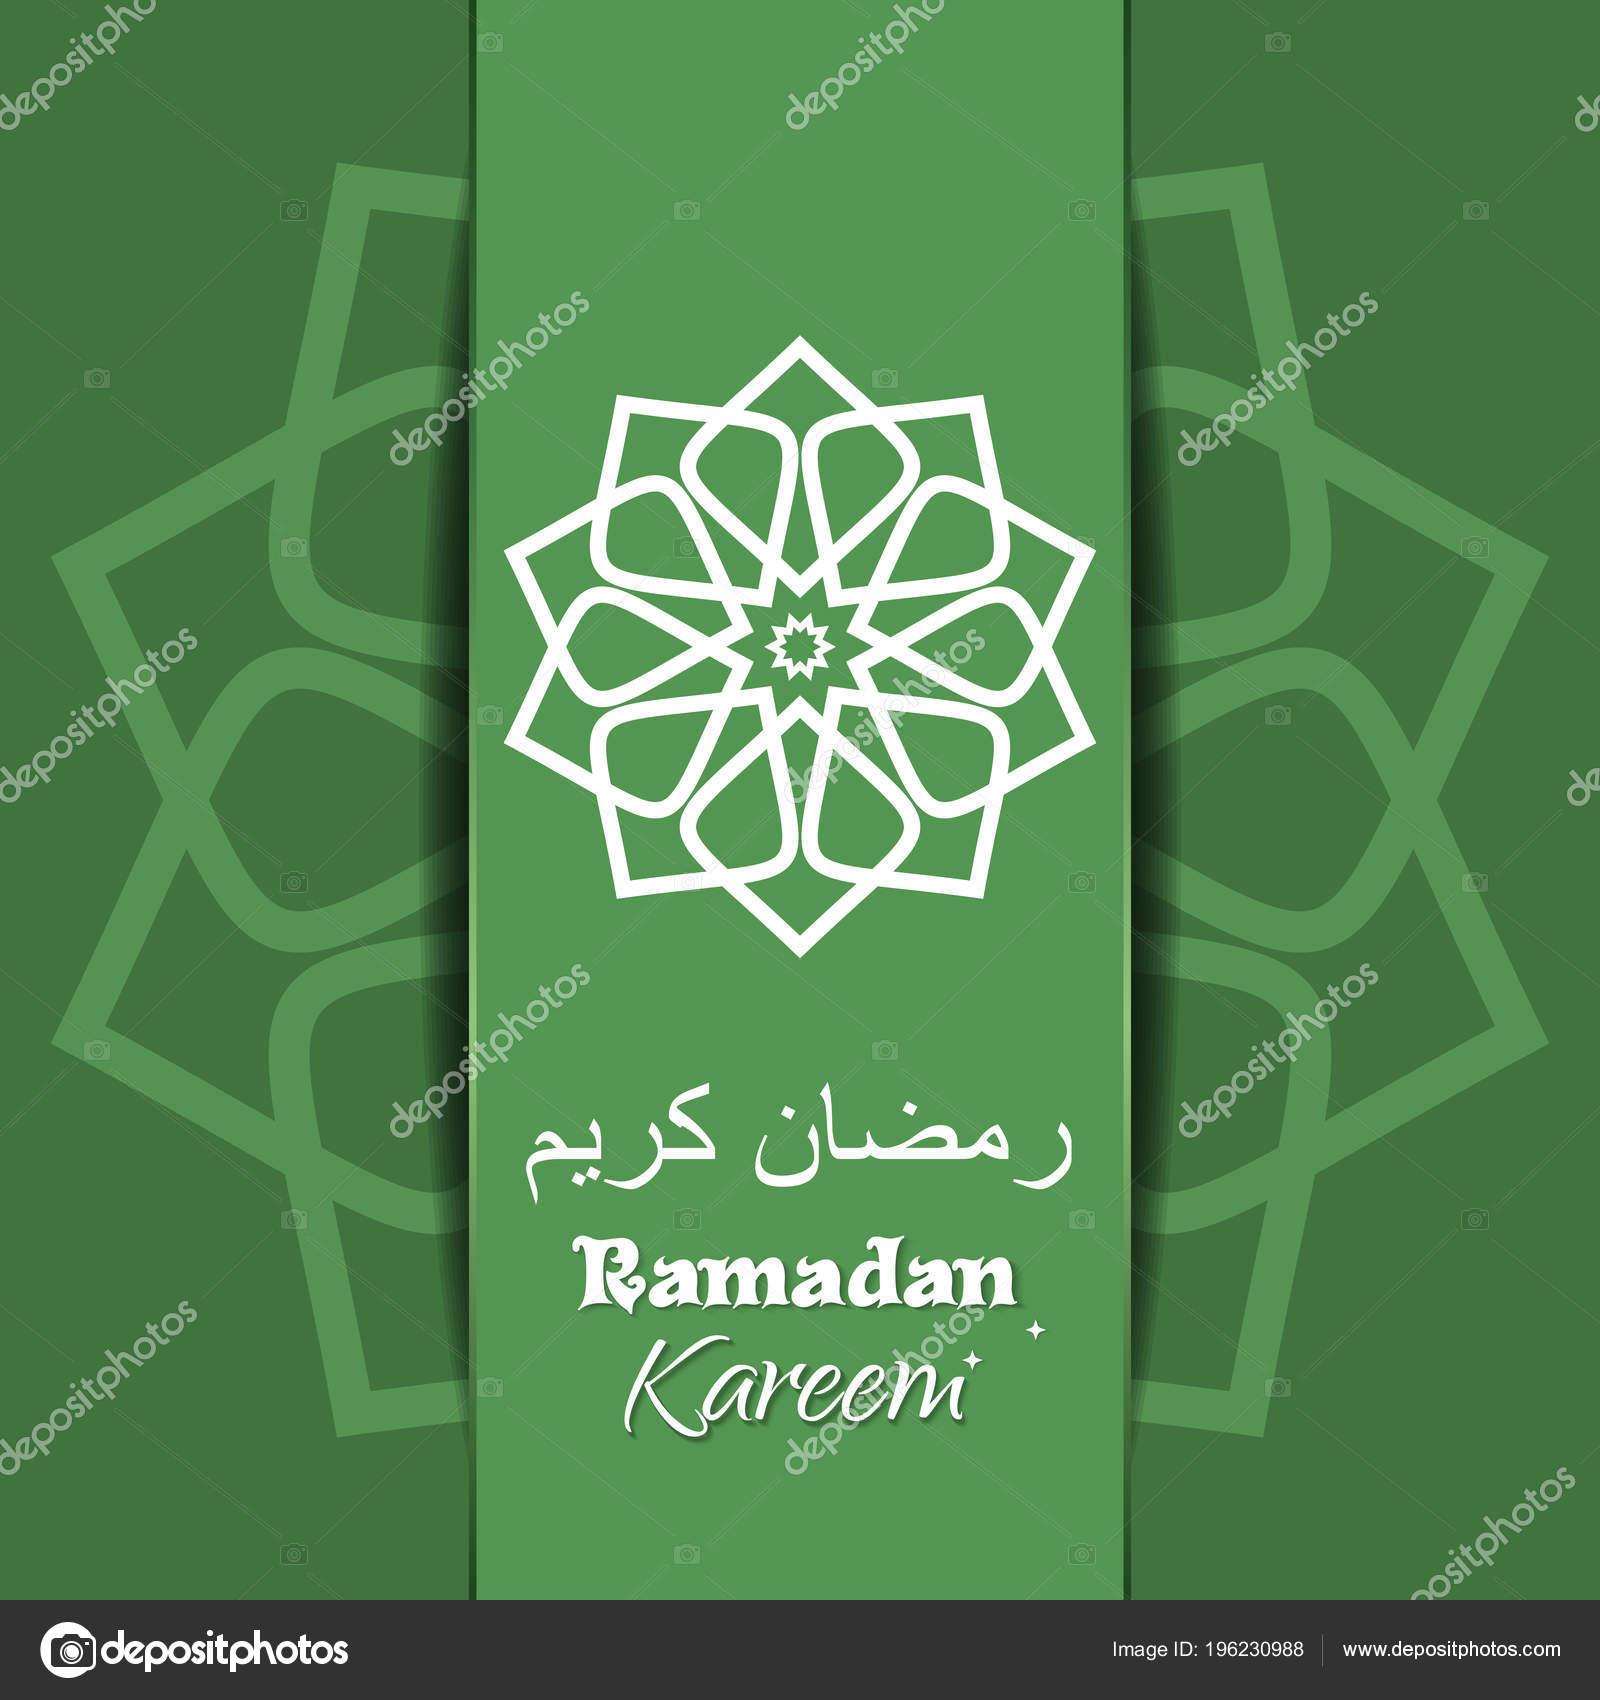 Ramadan Kareem Iscrizione Inglese Arabo Desiderare Ramadan Generoso